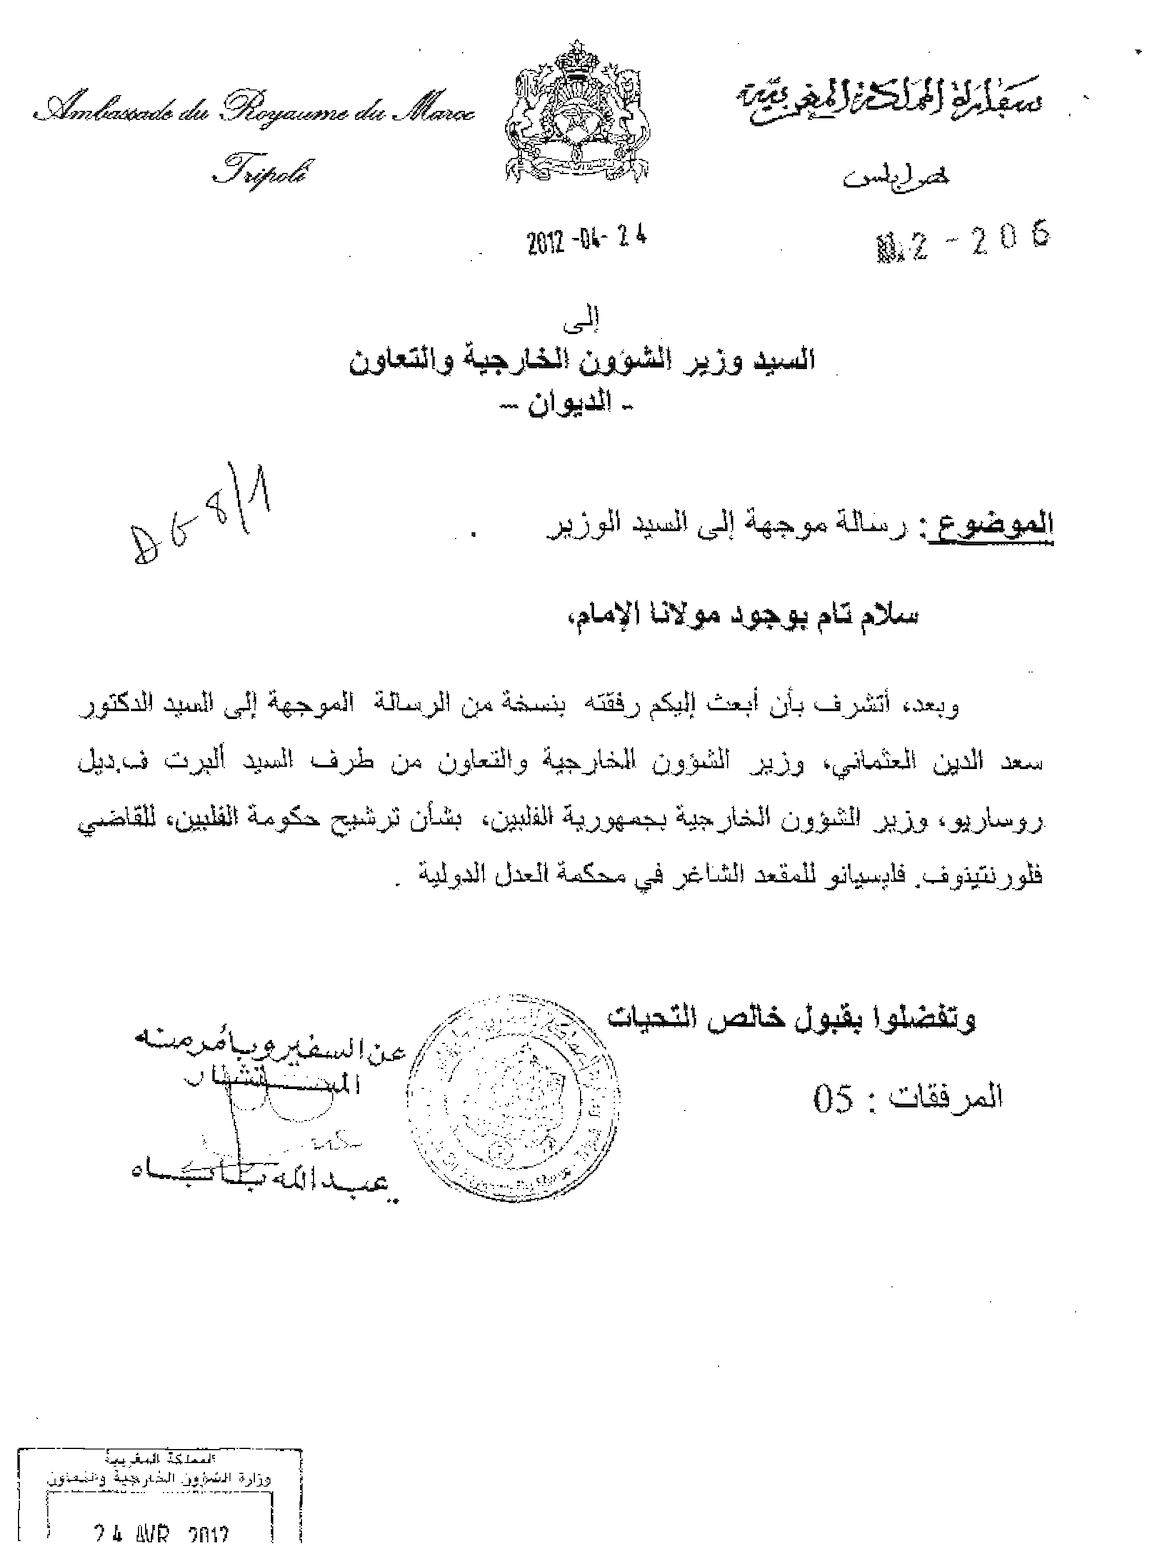 206 Tripoli